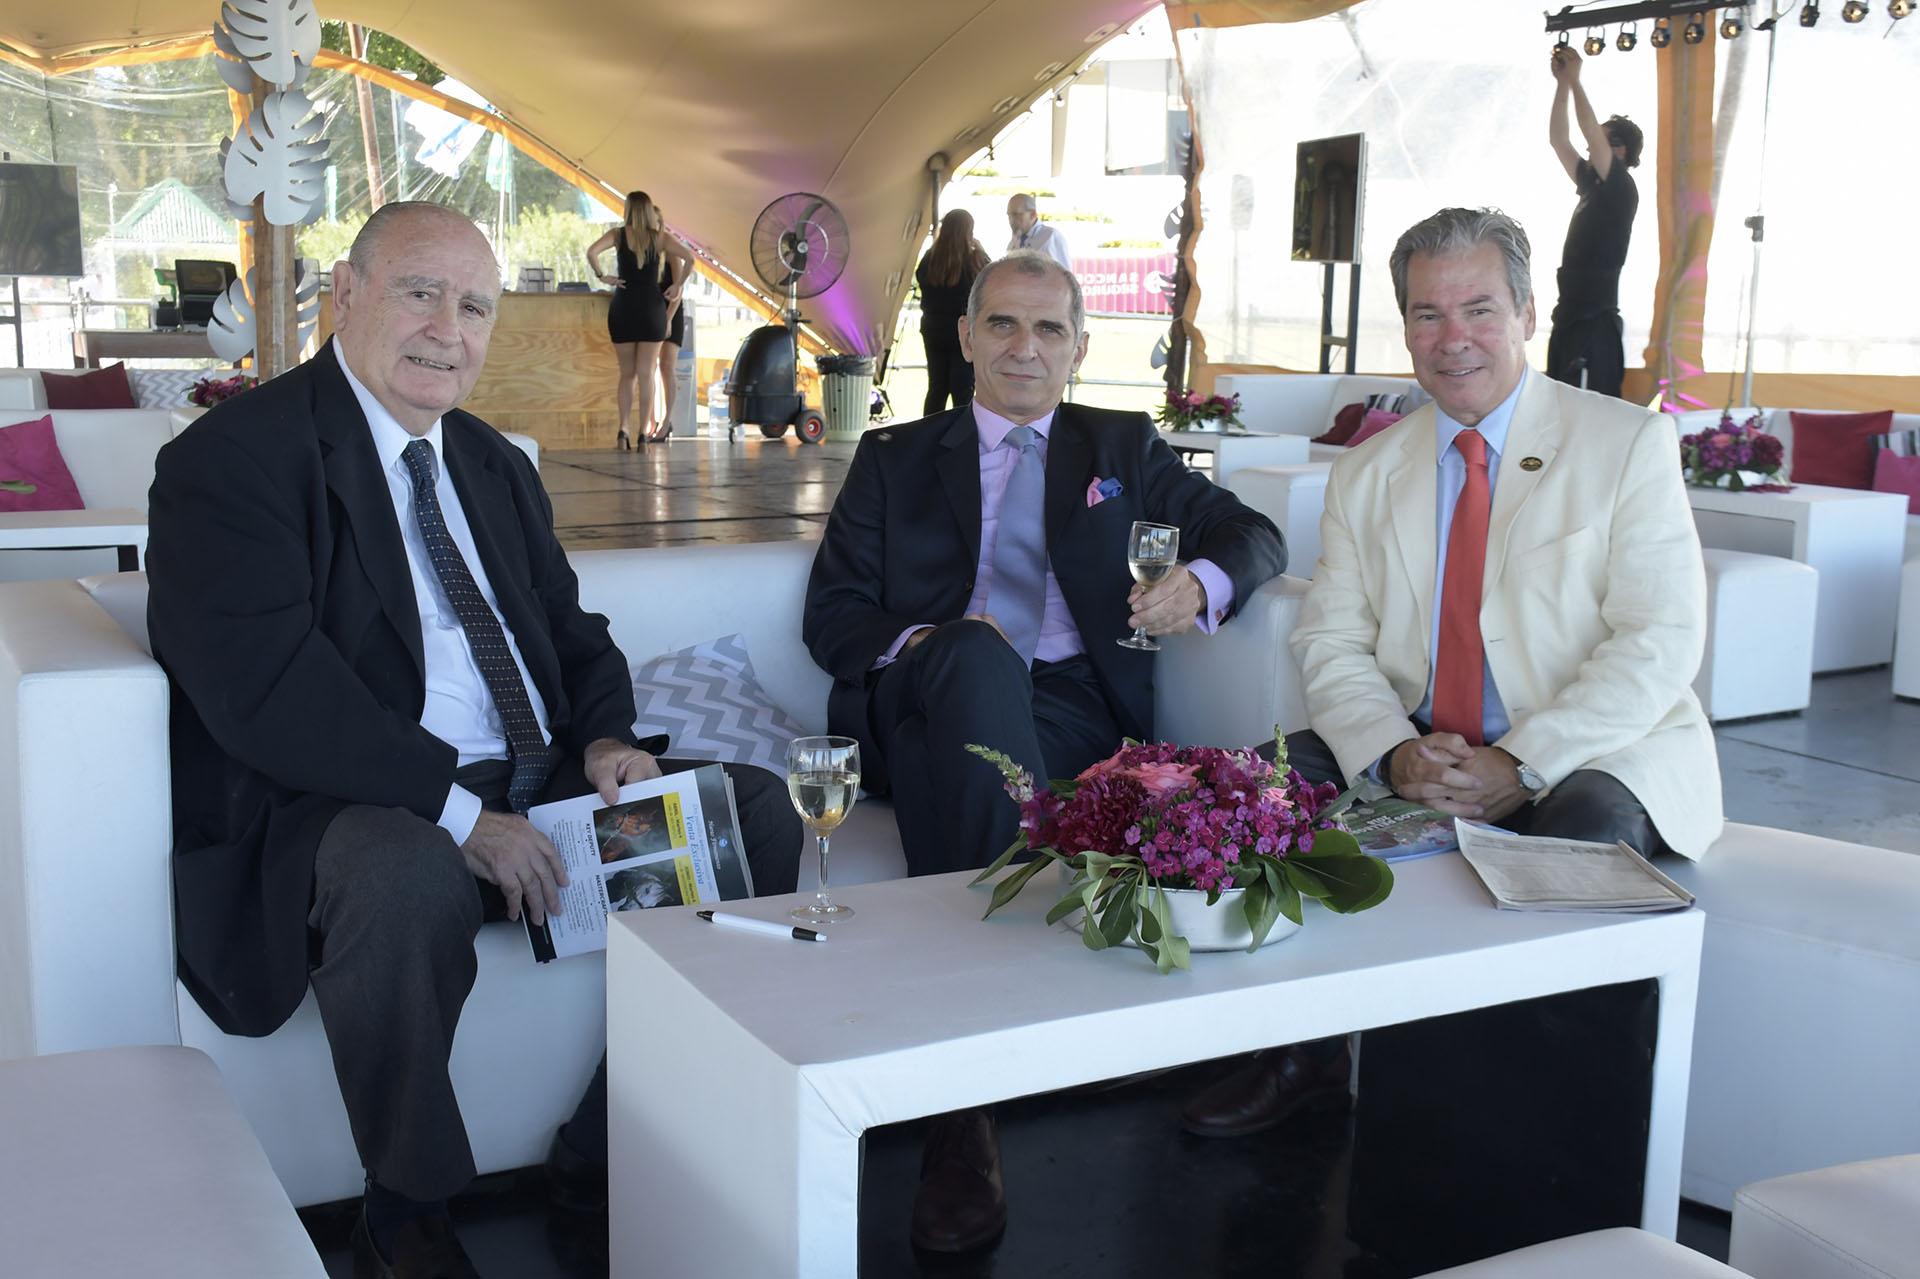 Alejandro Saravia, Gerardo Rodrigo Goyena y Alfredo Mayol, socios del Jockey Club